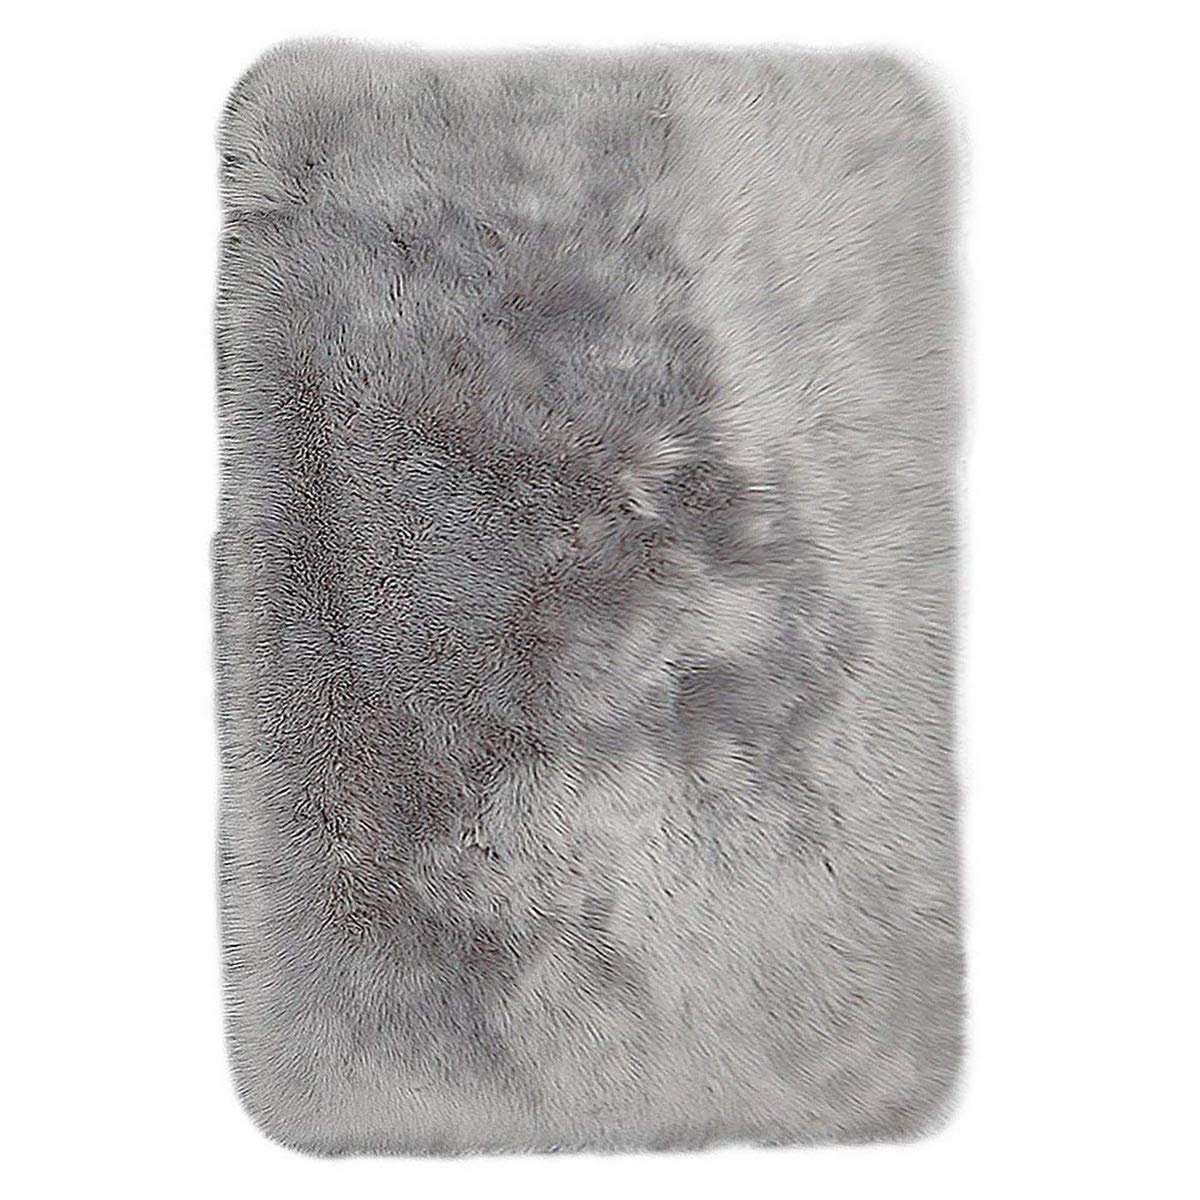 Junovo Luxury Plush Fuax Sheepskin Area Rug Fluffy Fuax Fur Shag Carpet, 2ft x 3ft Grey